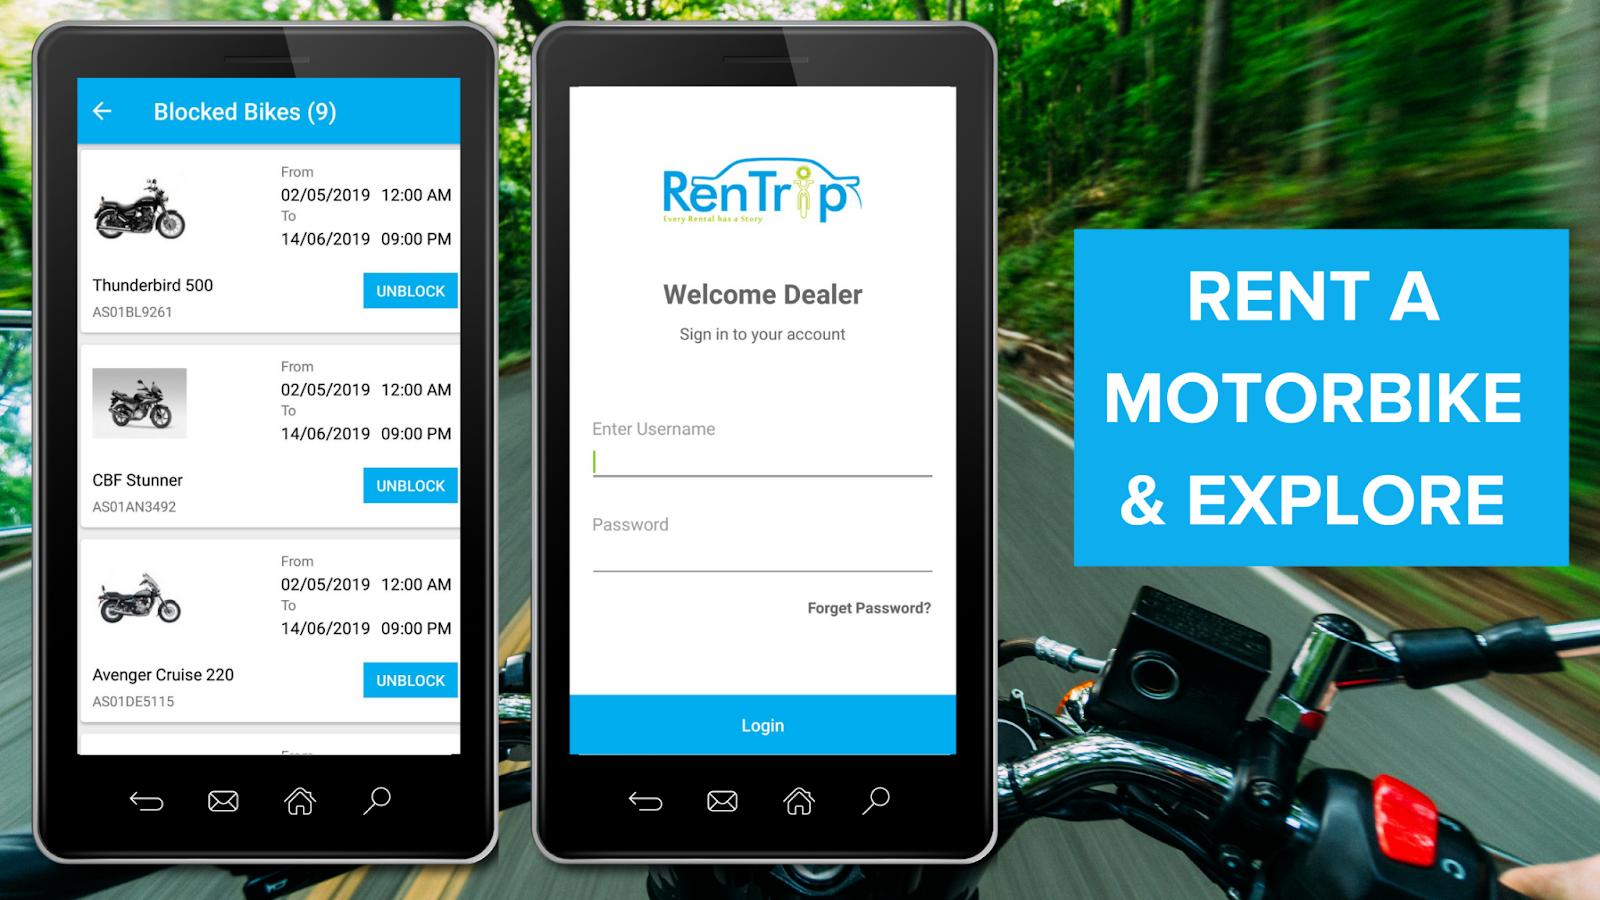 Rentrip Business Model - Jugnoo